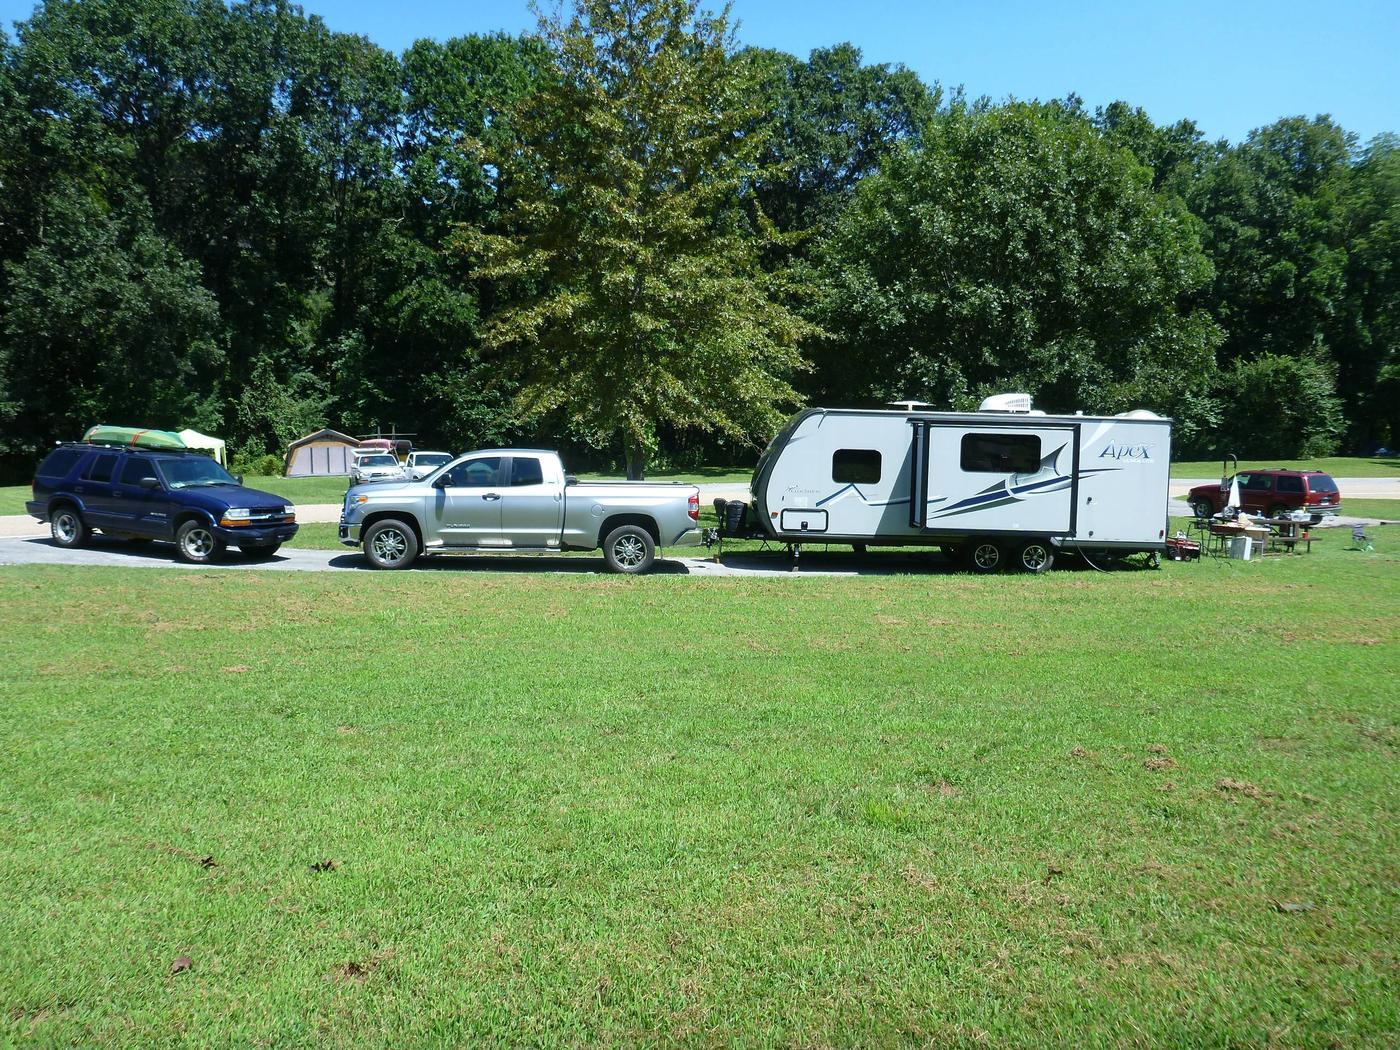 Tyler Bend Main Loop Site# 16-4Site #16, 58' back-in, tent pad 15' x 15'.